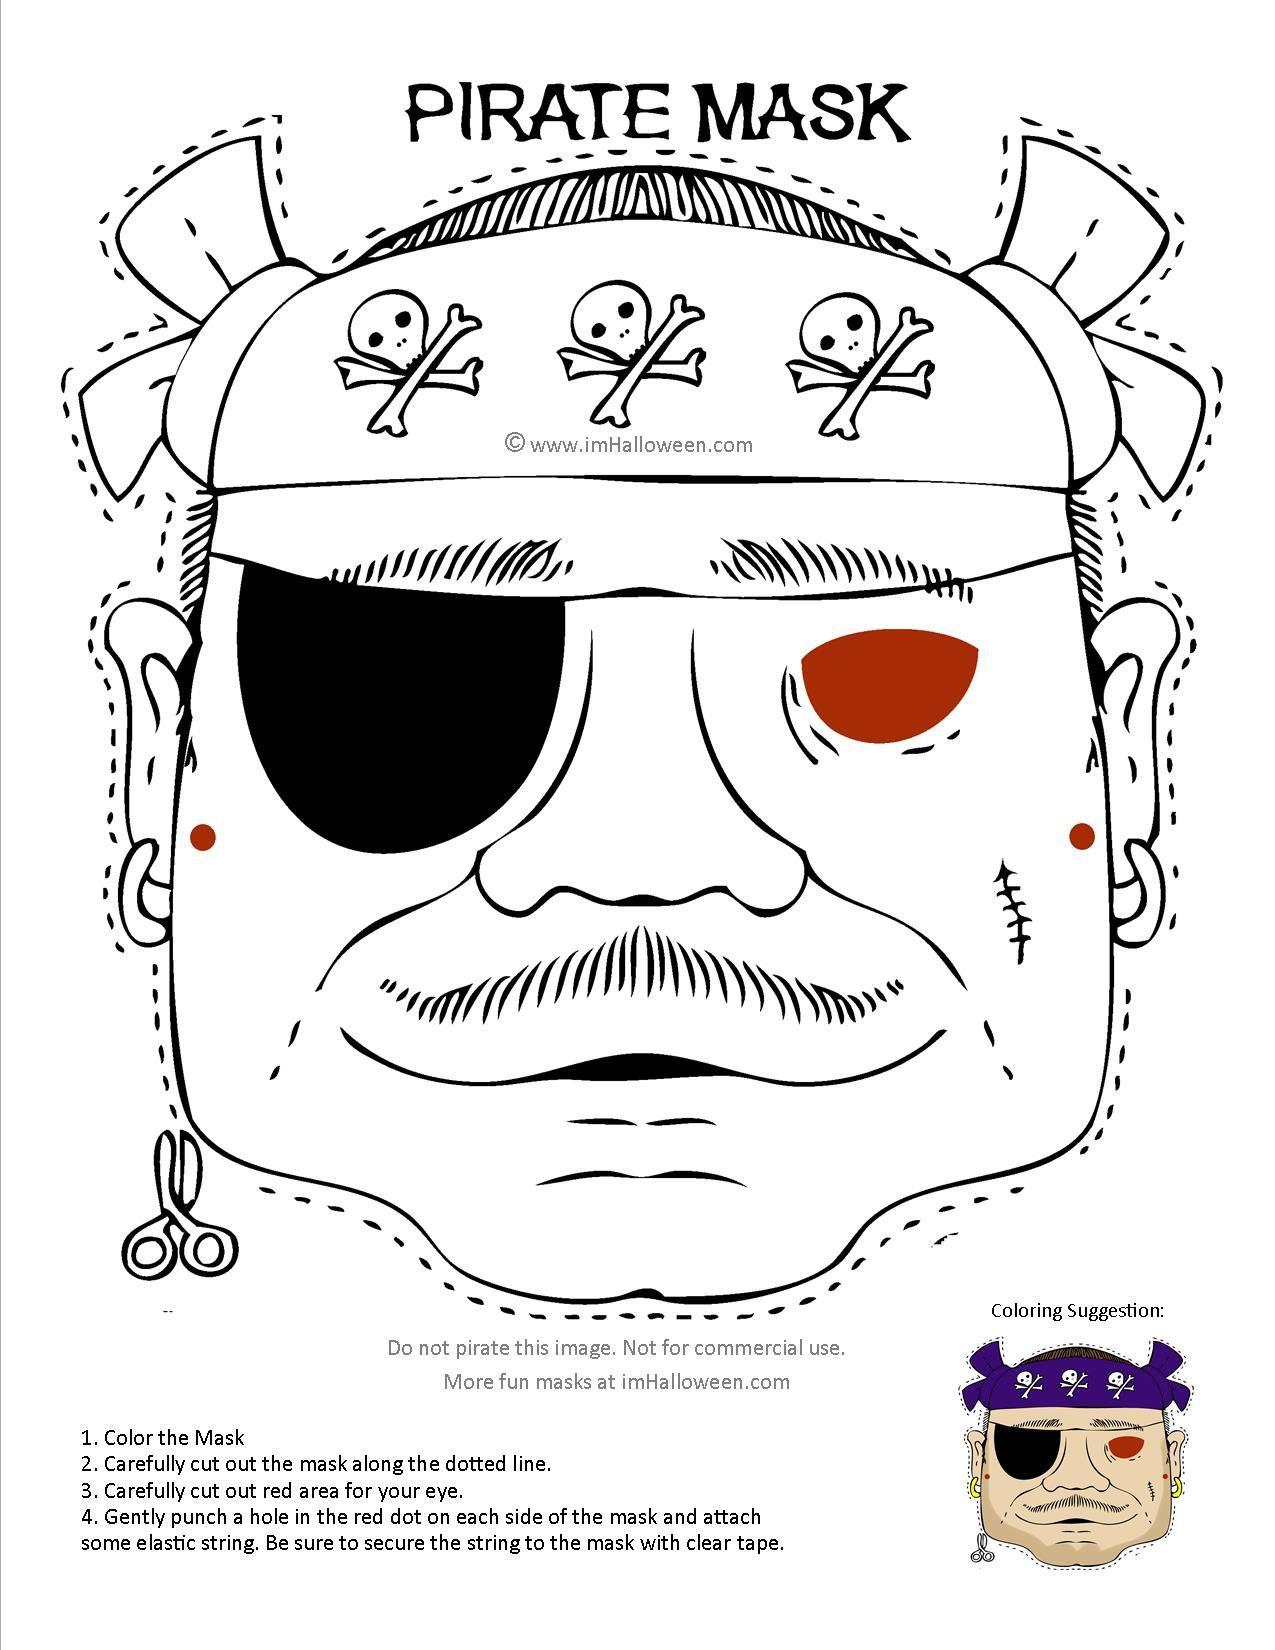 Pirate Mask Coloring Page Printout More Fun At